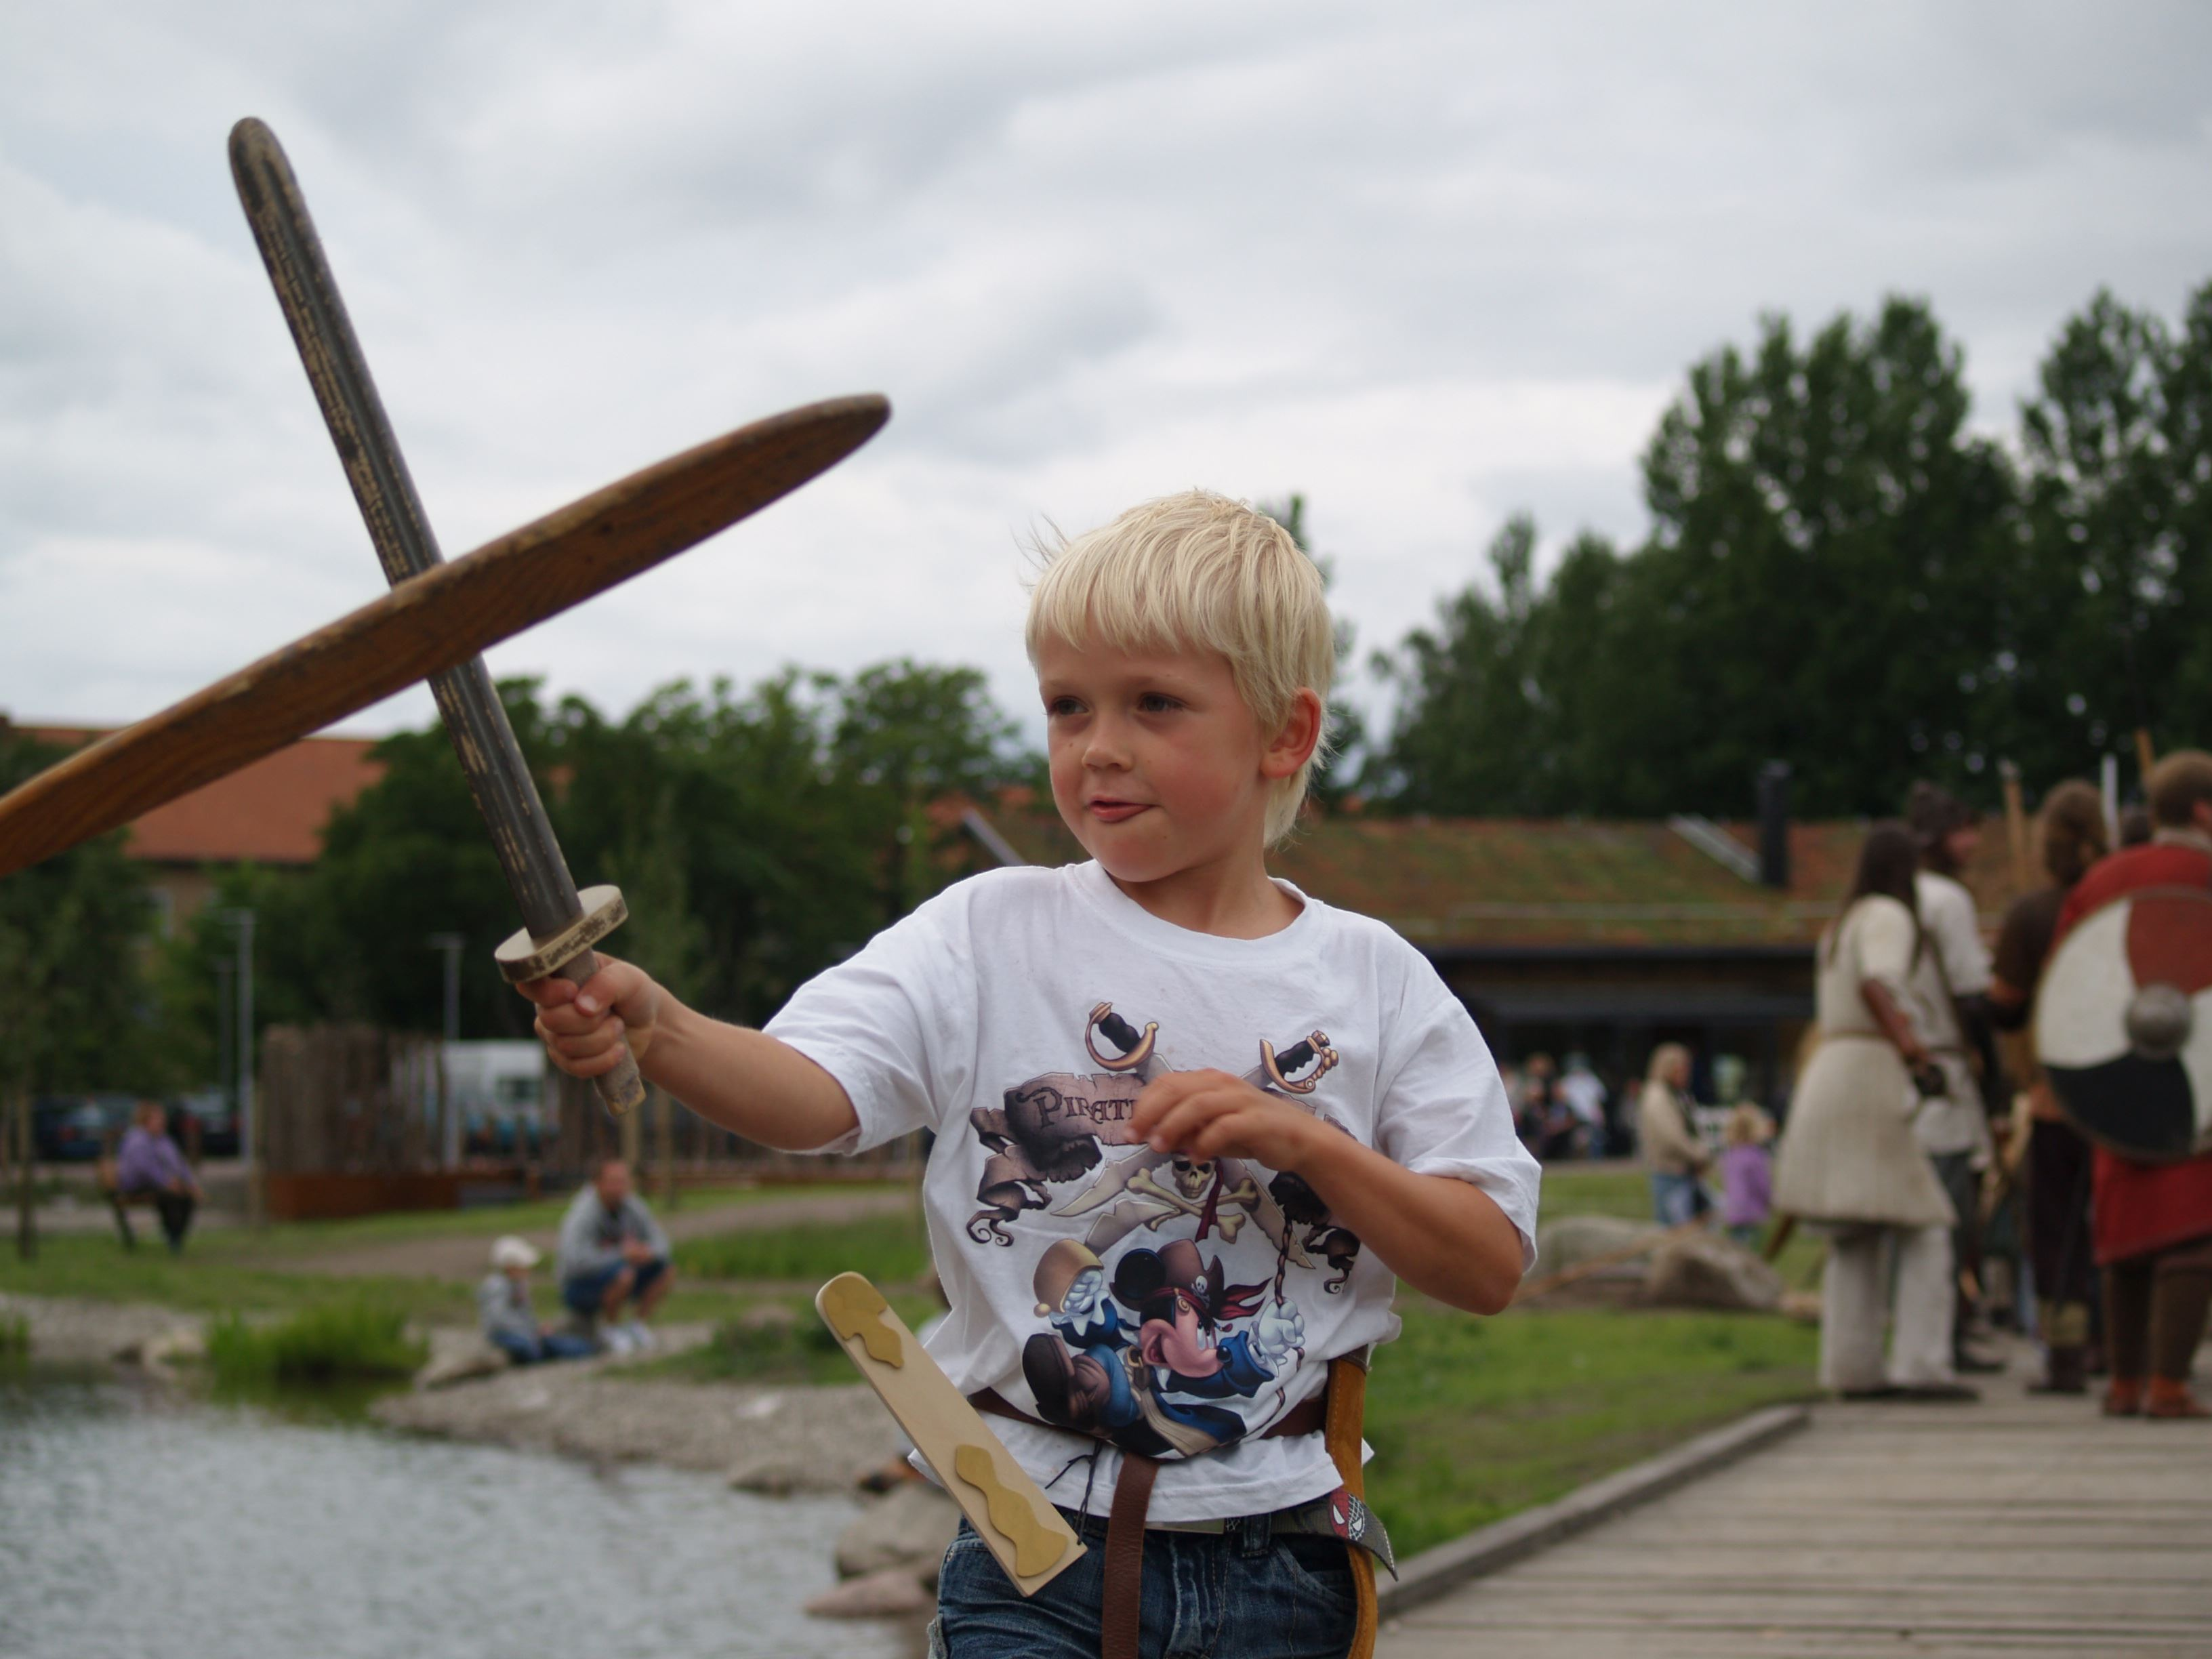 Jeanette Jandermark, The Viking fortress Trelleborgen